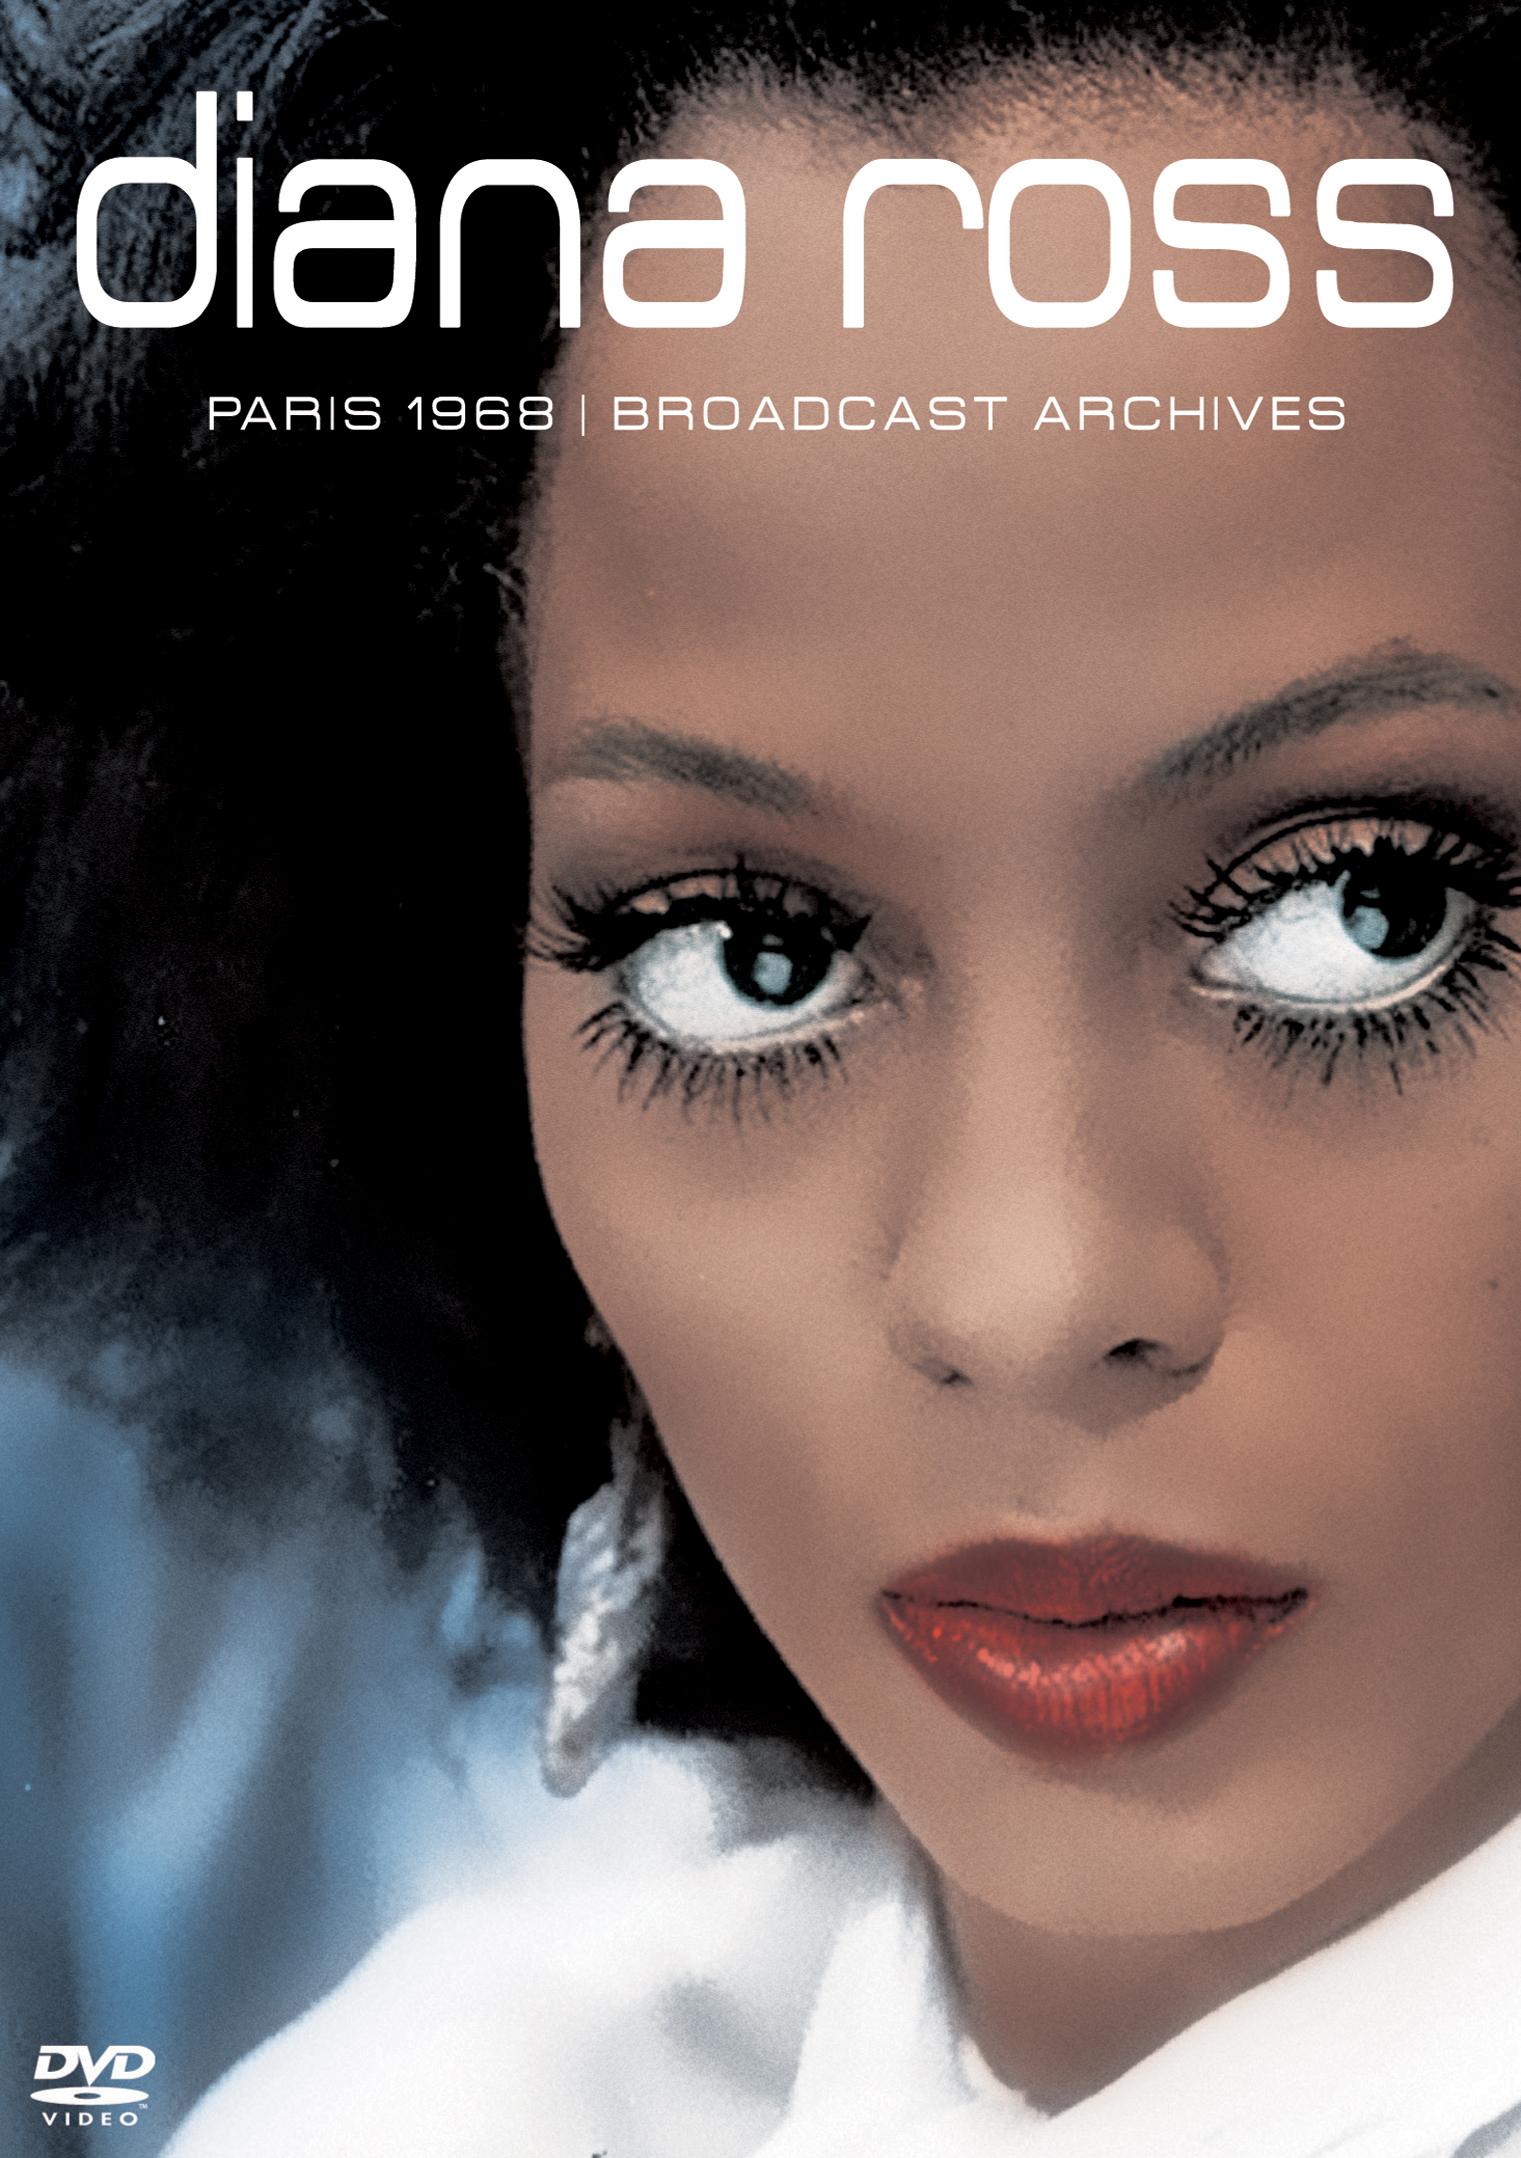 Diana Ross: Paris 1968 - Broadcast Archives